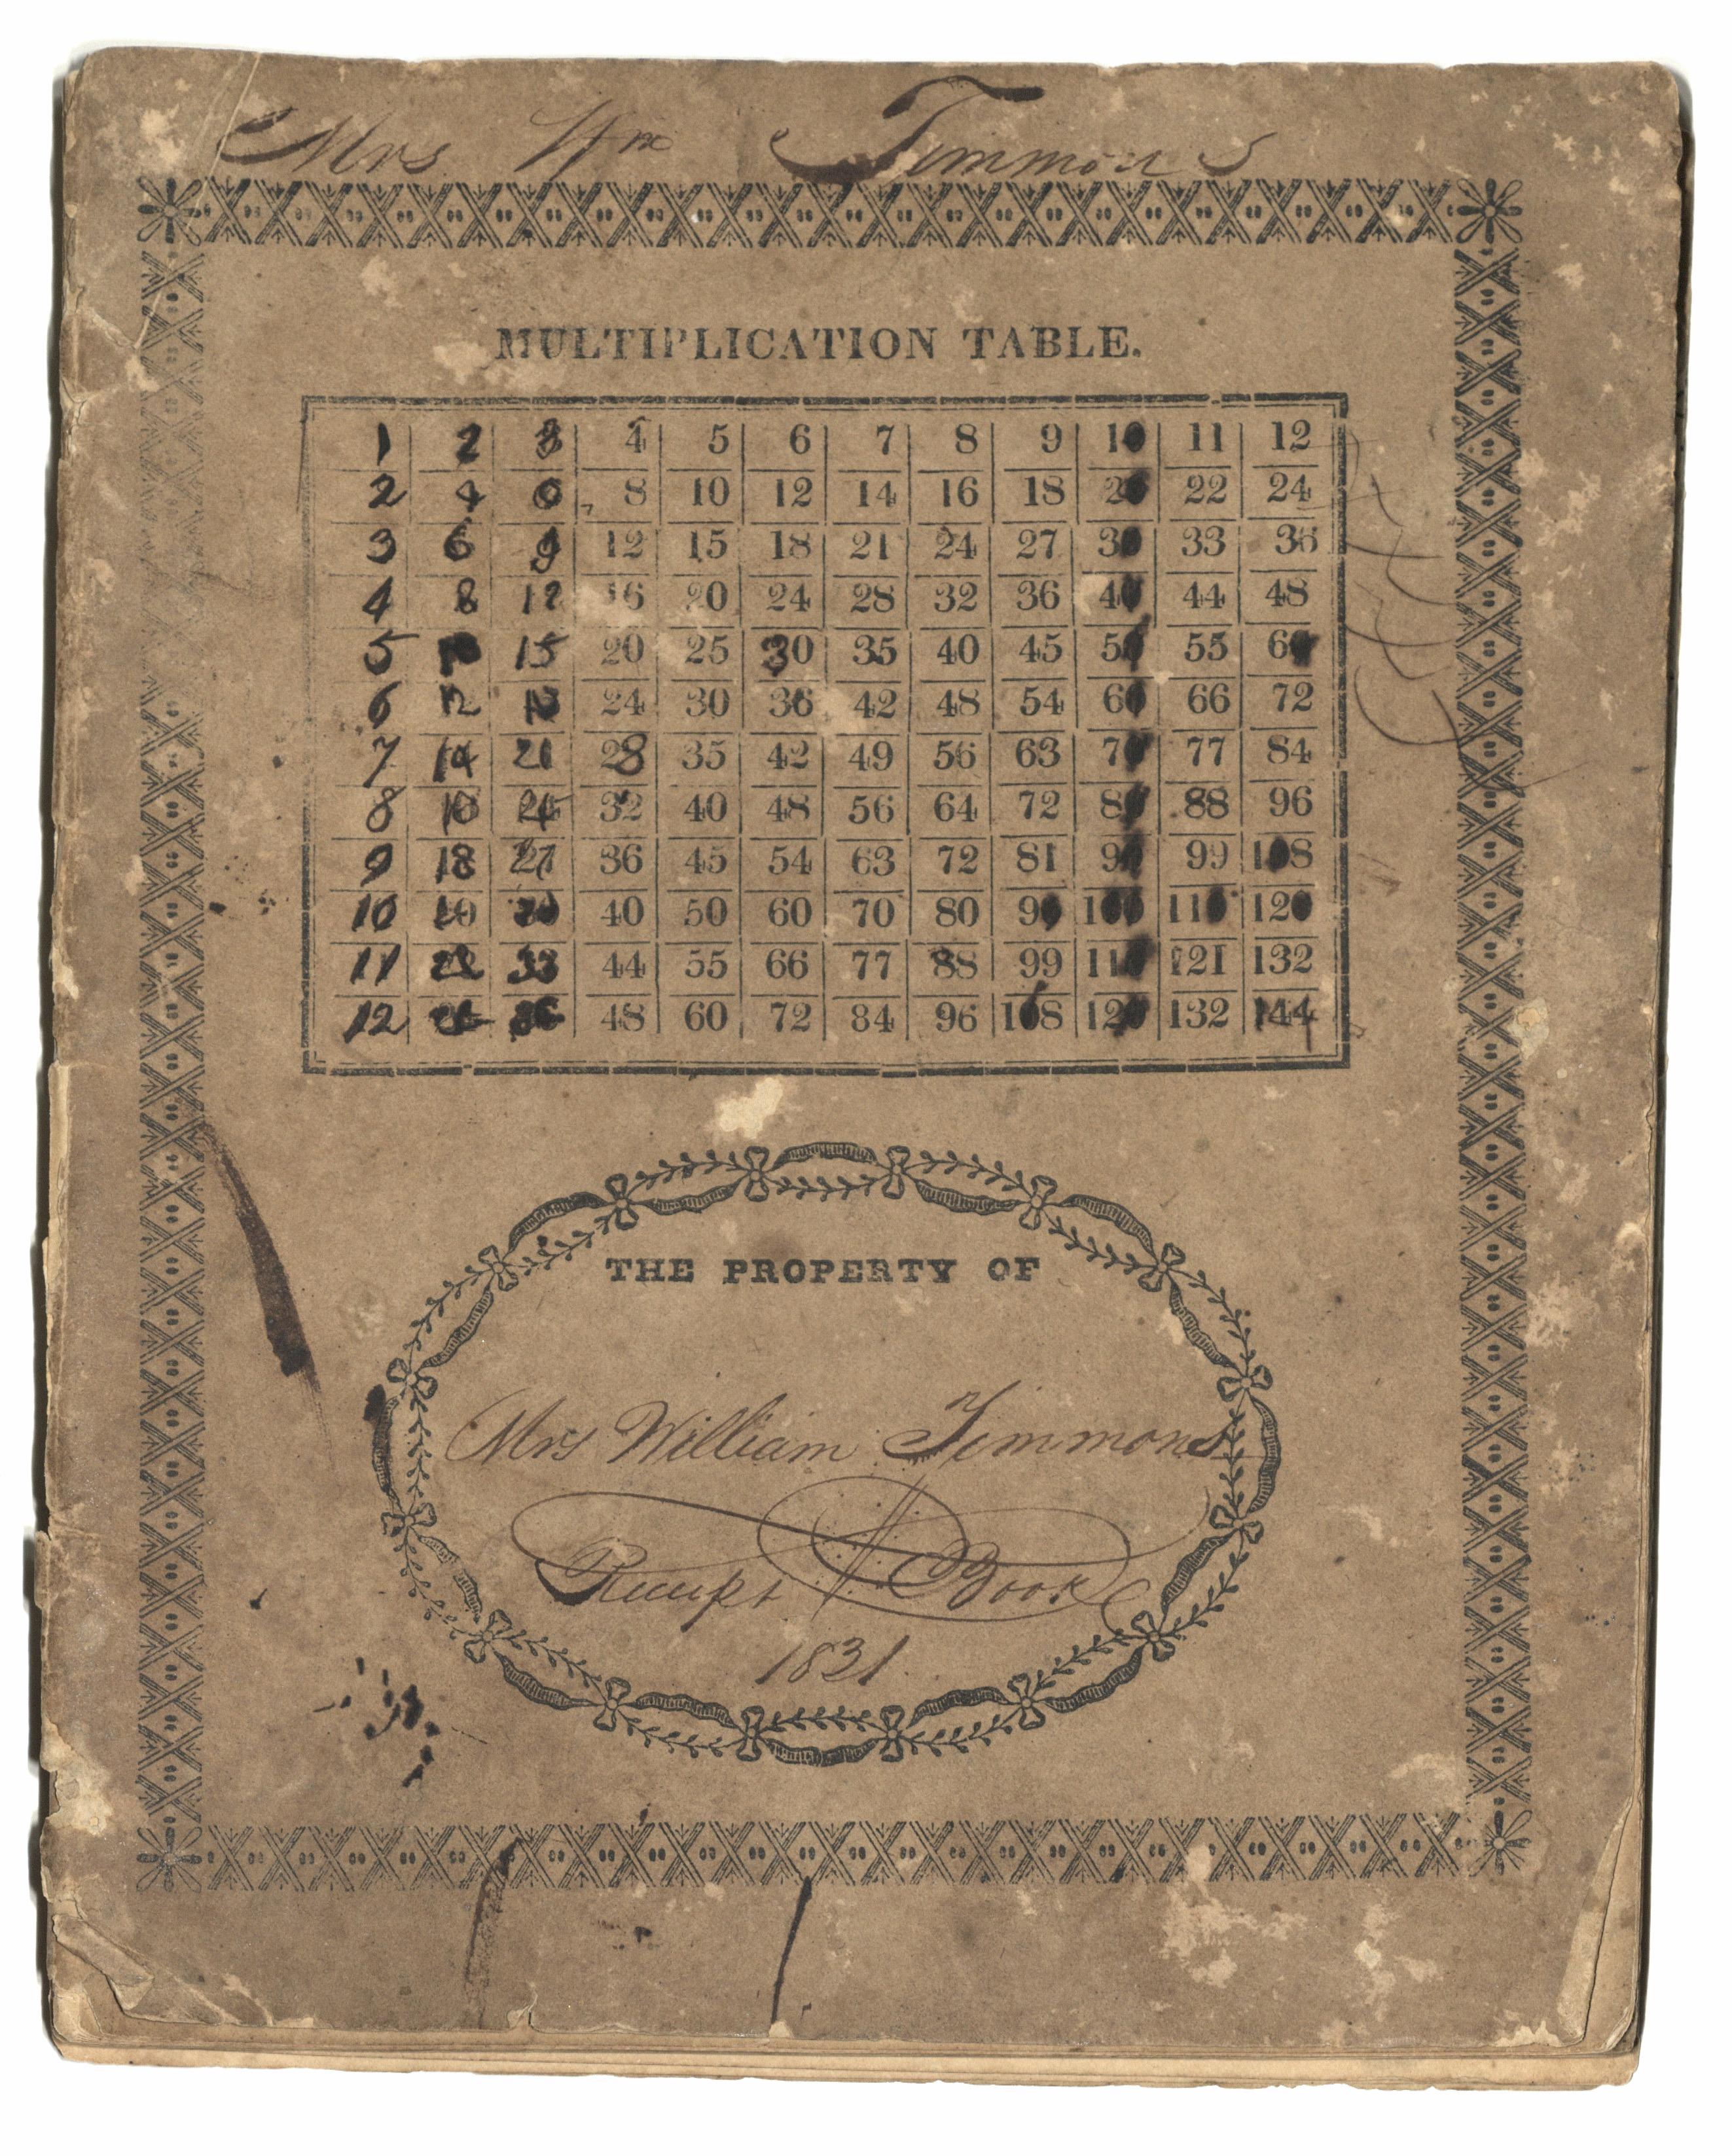 Mrs. William Timmons Receipt Book